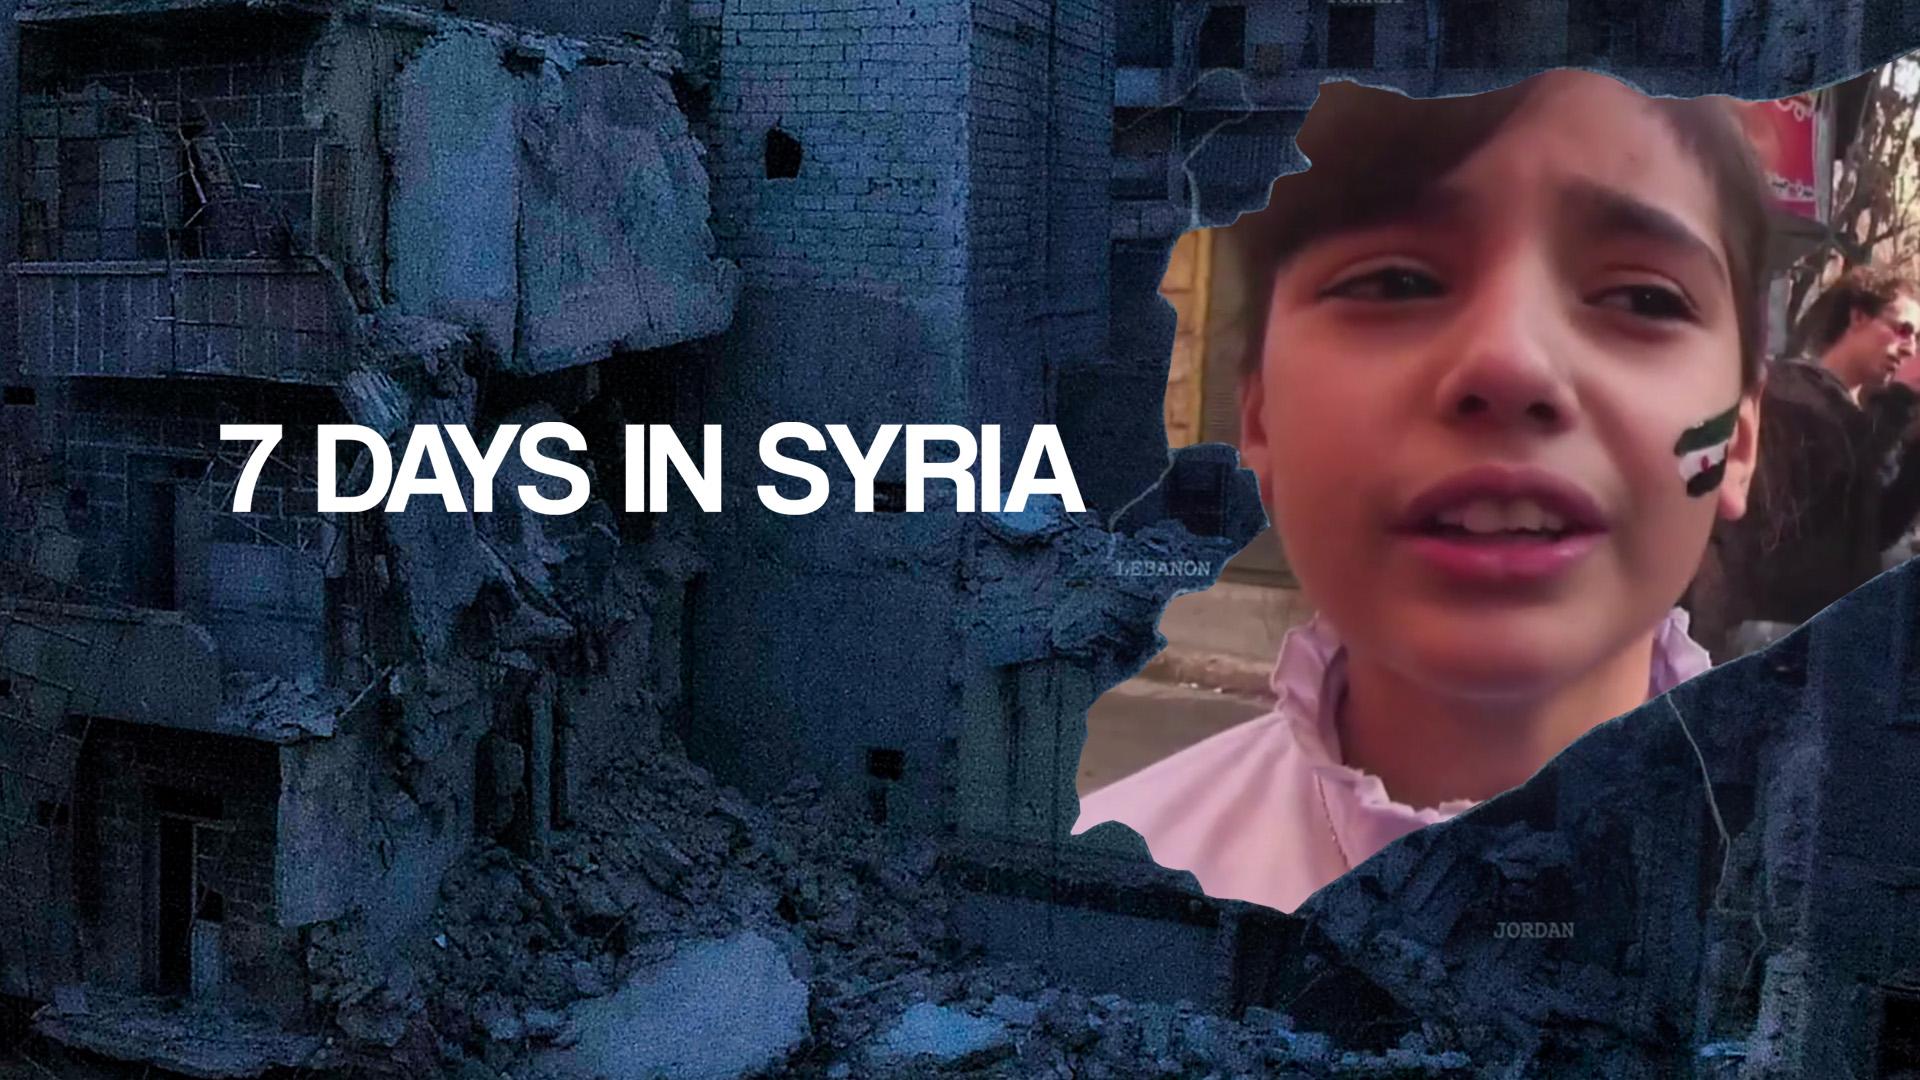 7 Days in Syria